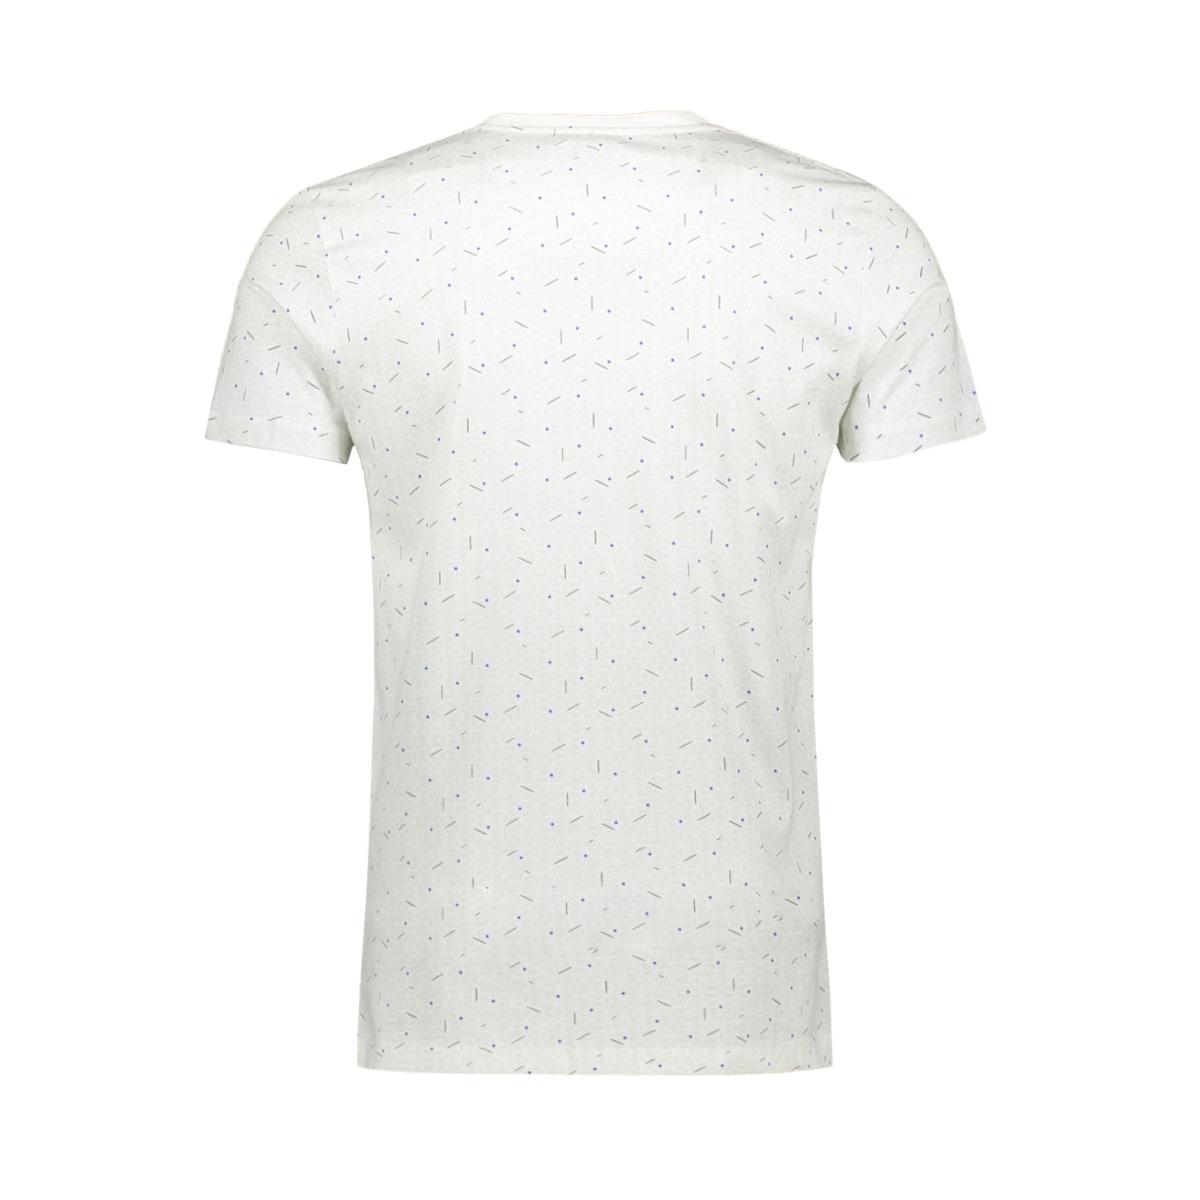 t shirt met all over print g91010 garcia t-shirt 53 off white